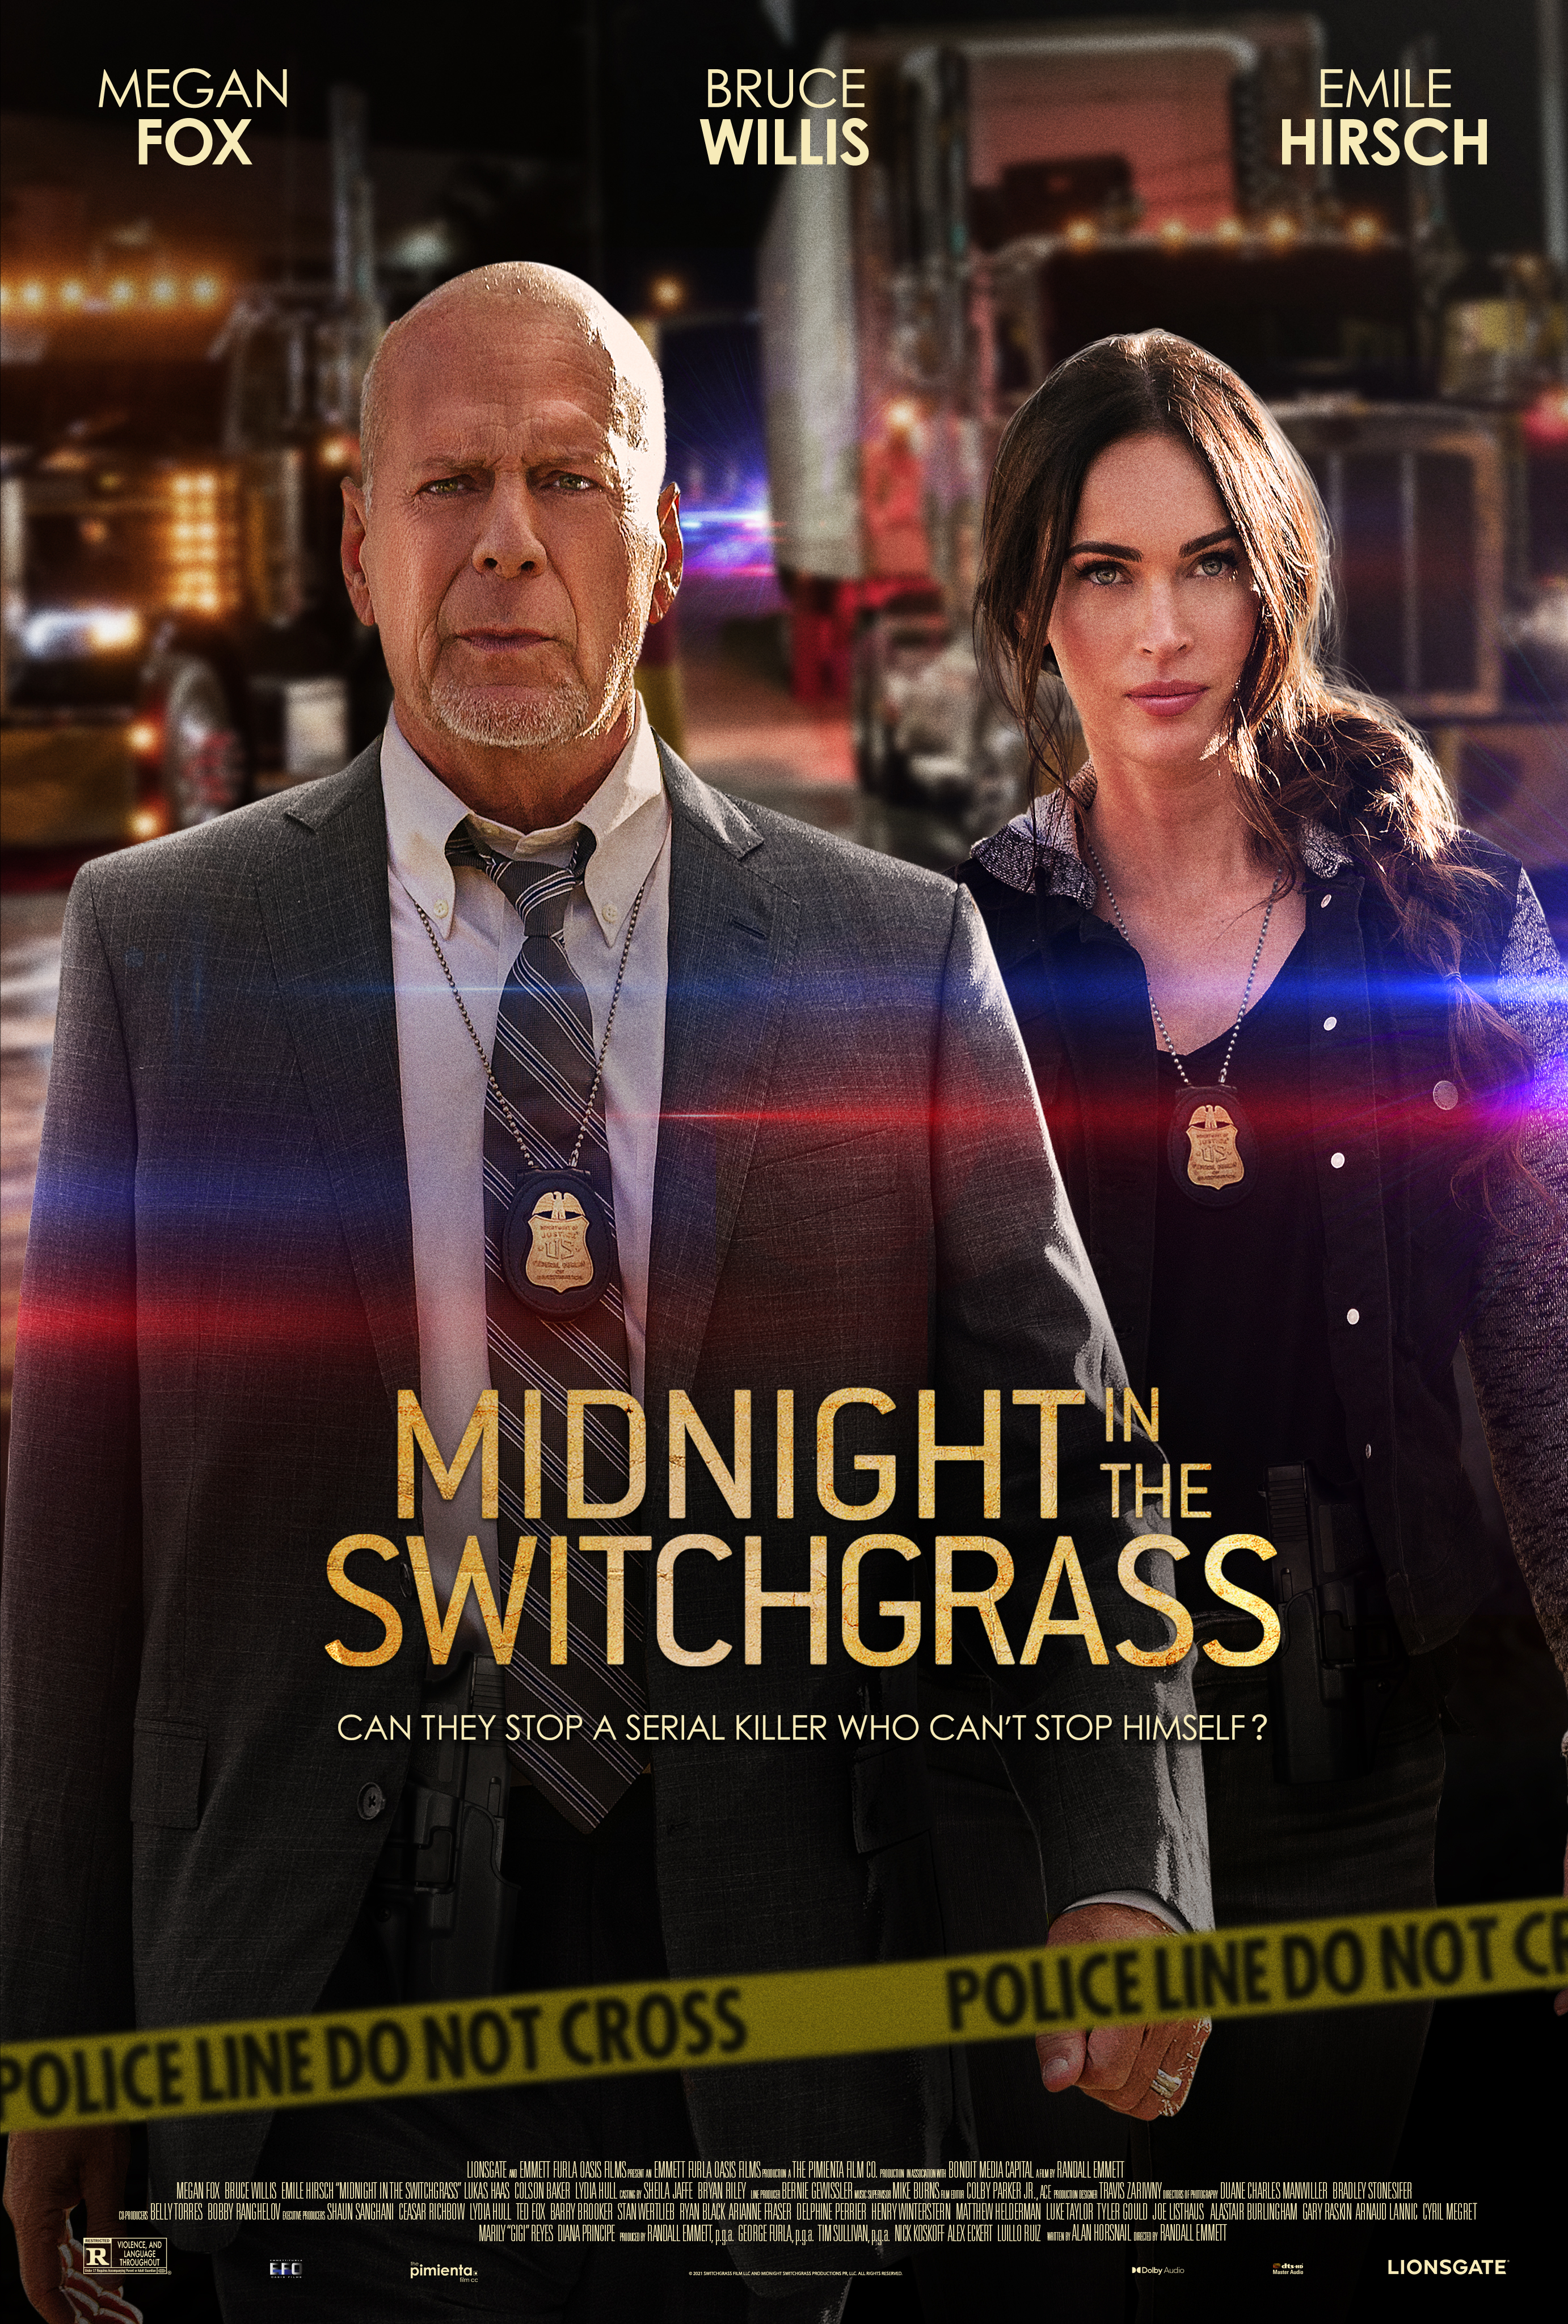 Phim Nửa đêm ở Switchgrass - Midnight in the Switchgrass (2021)